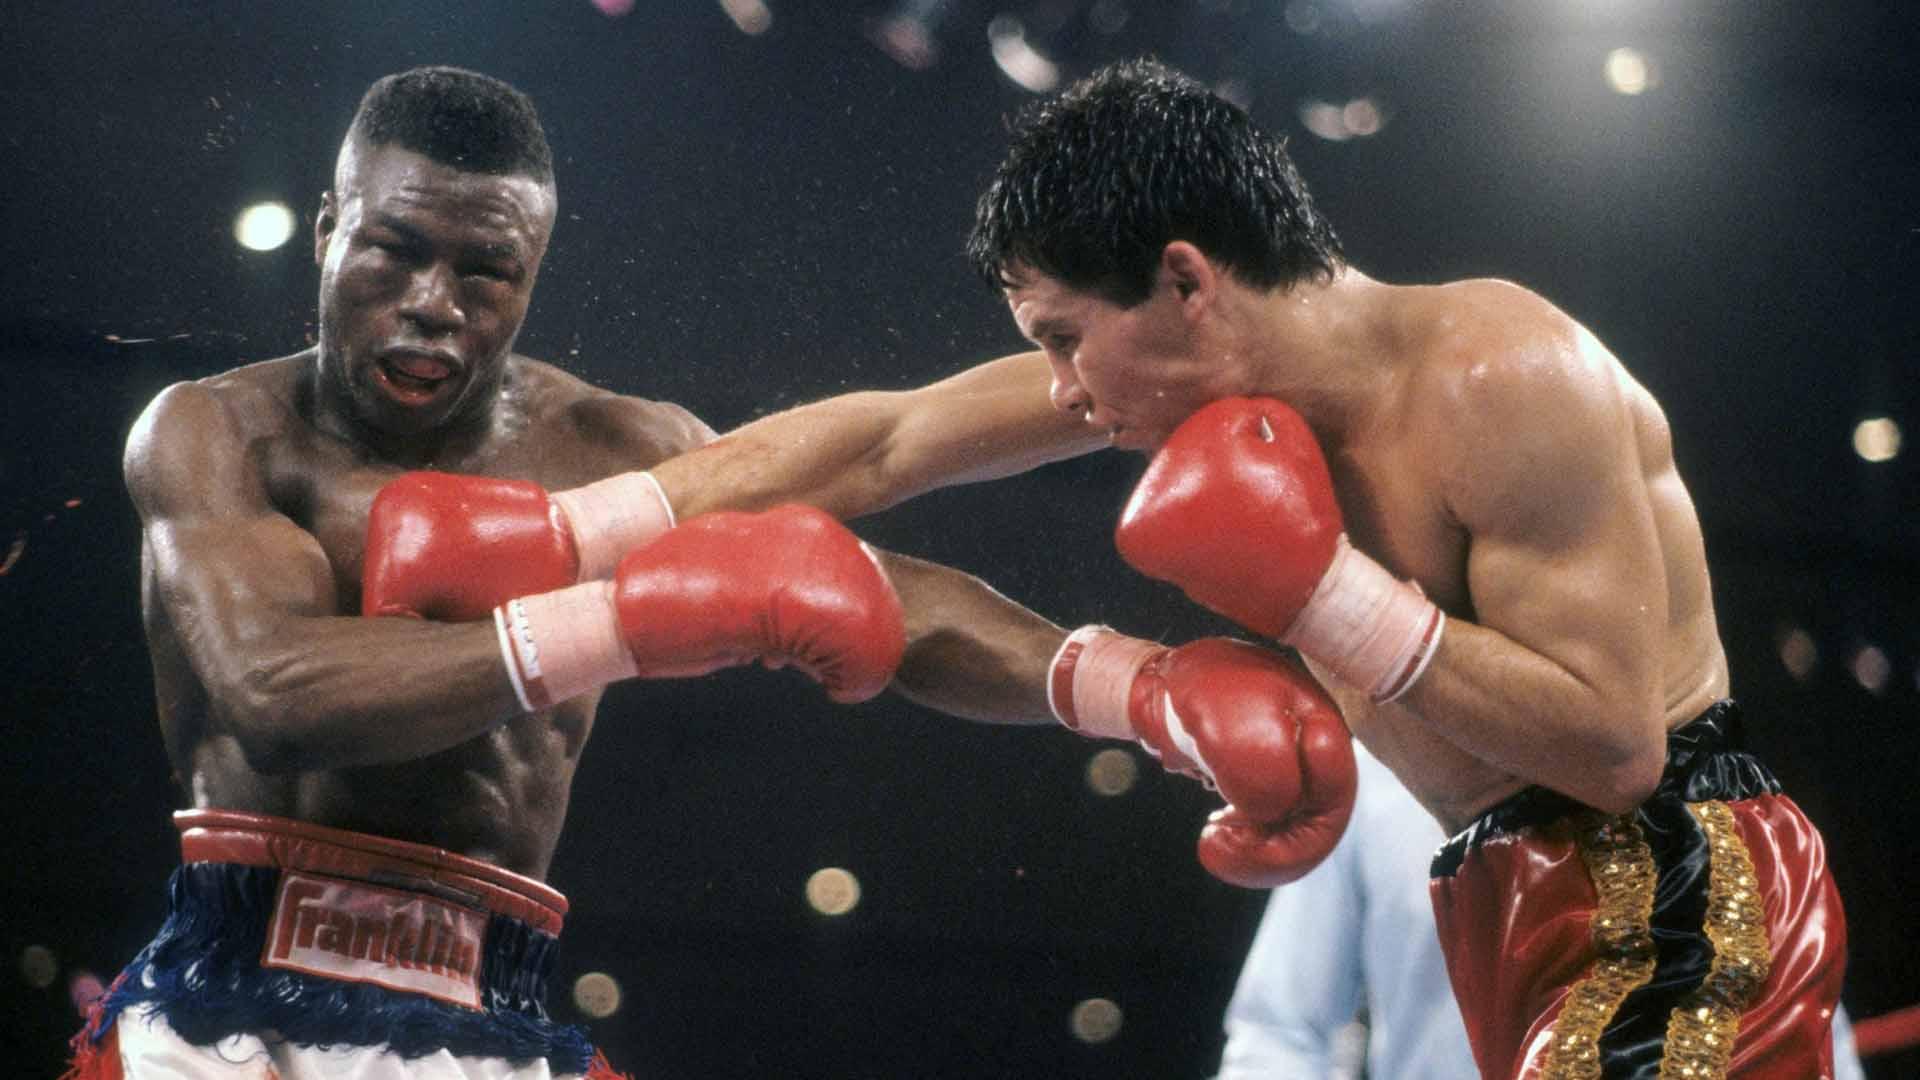 melhores lutas de boxe Julio César Chávez x Meldrick Taylor